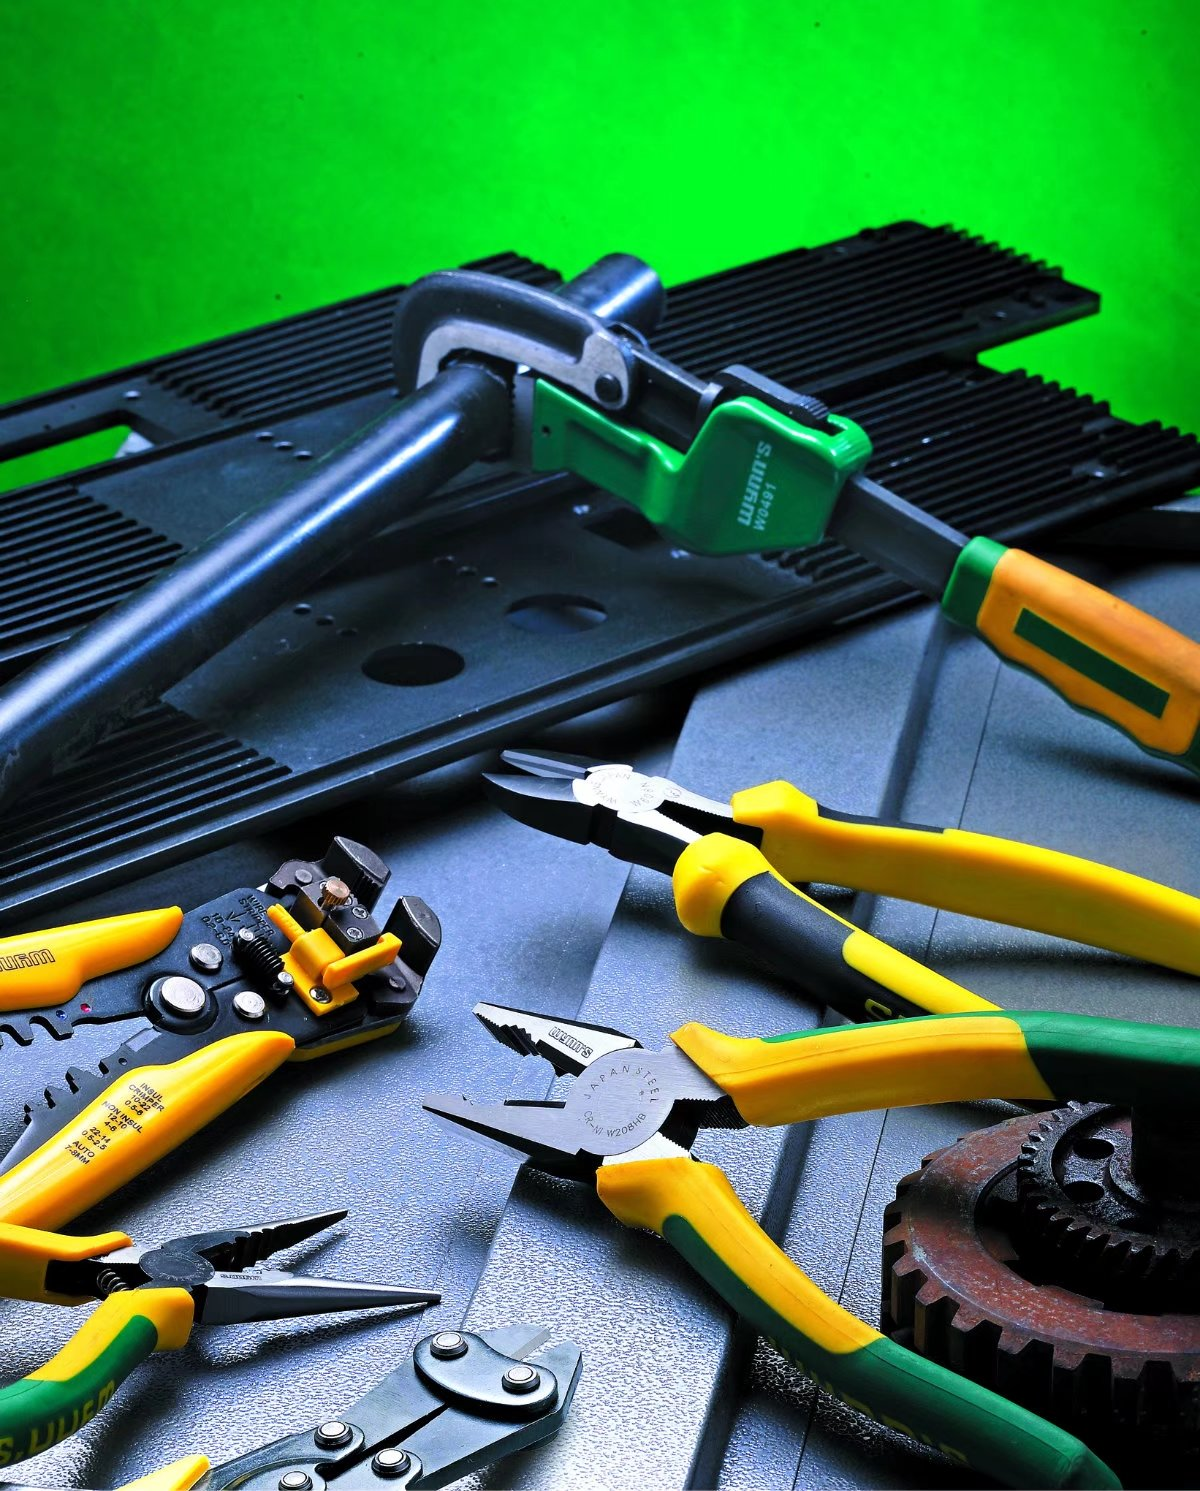 A型断线钳、什么牌子断线钳好、哪个剪切工具好用 A型断线钳、钢丝绳剪、电缆剪